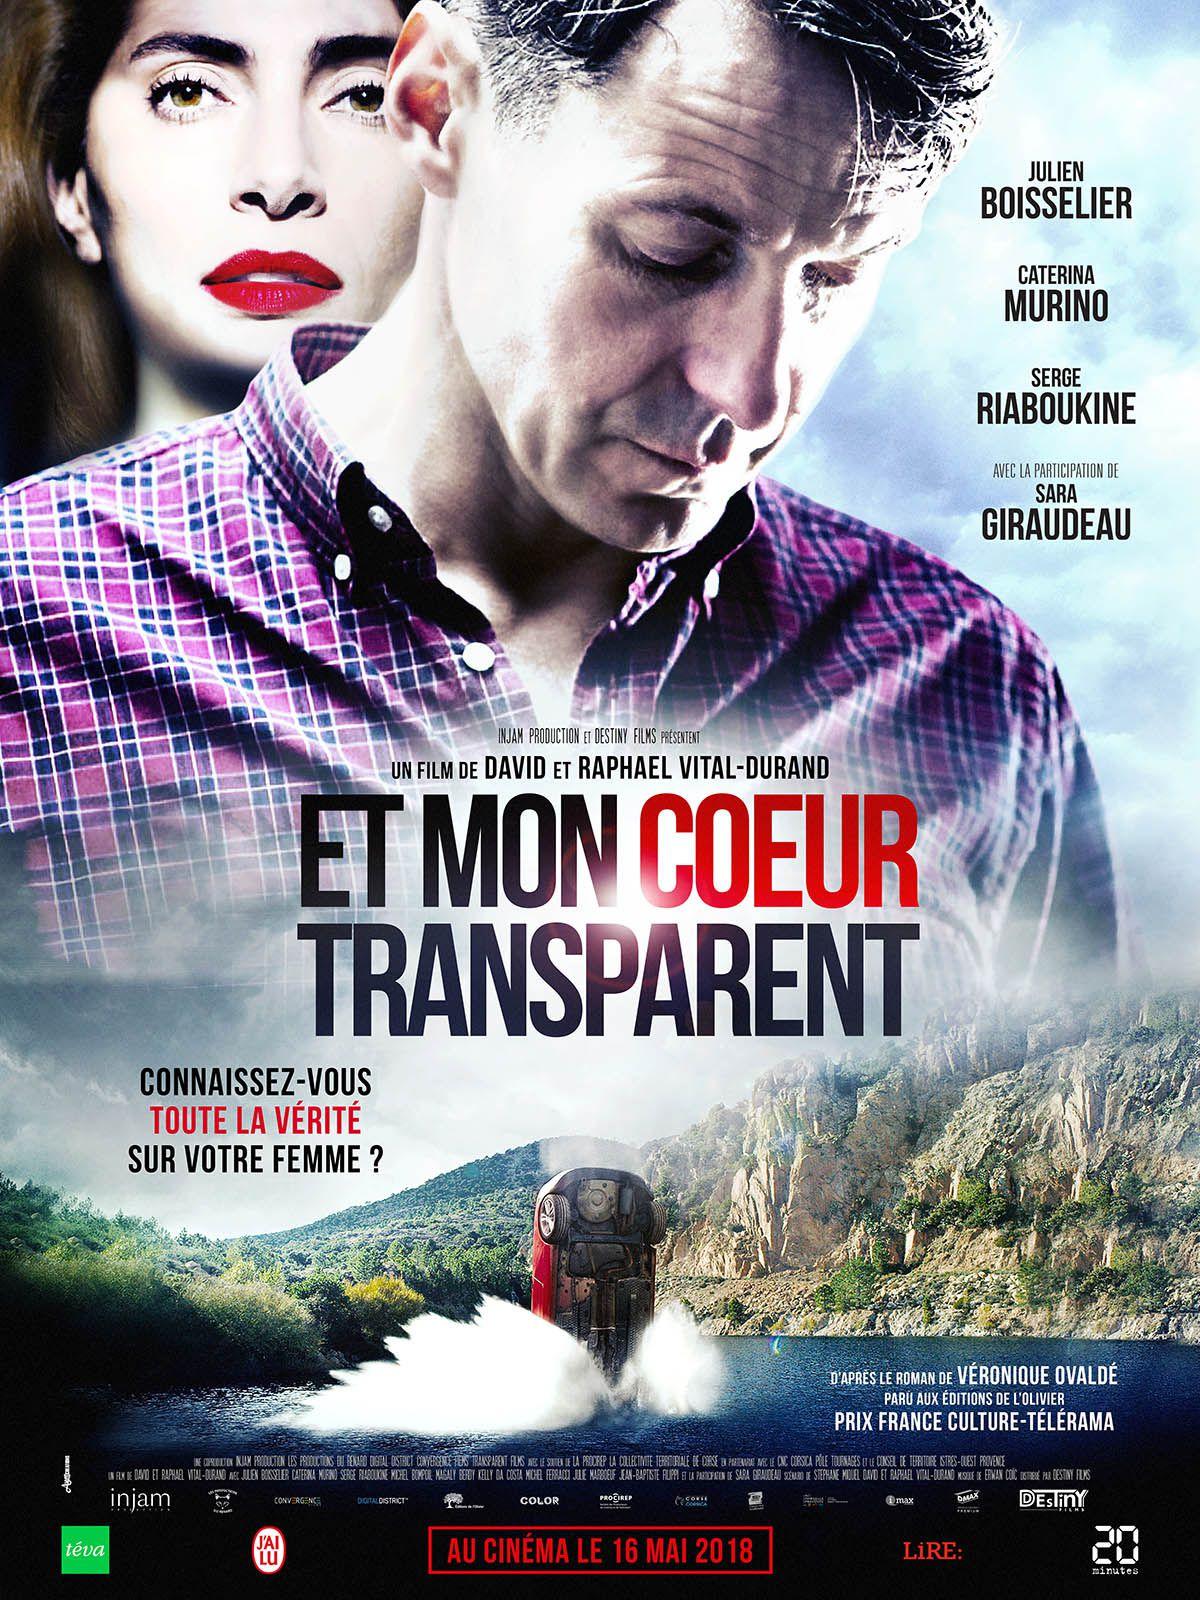 Et mon cœur transparent - Film (2018)